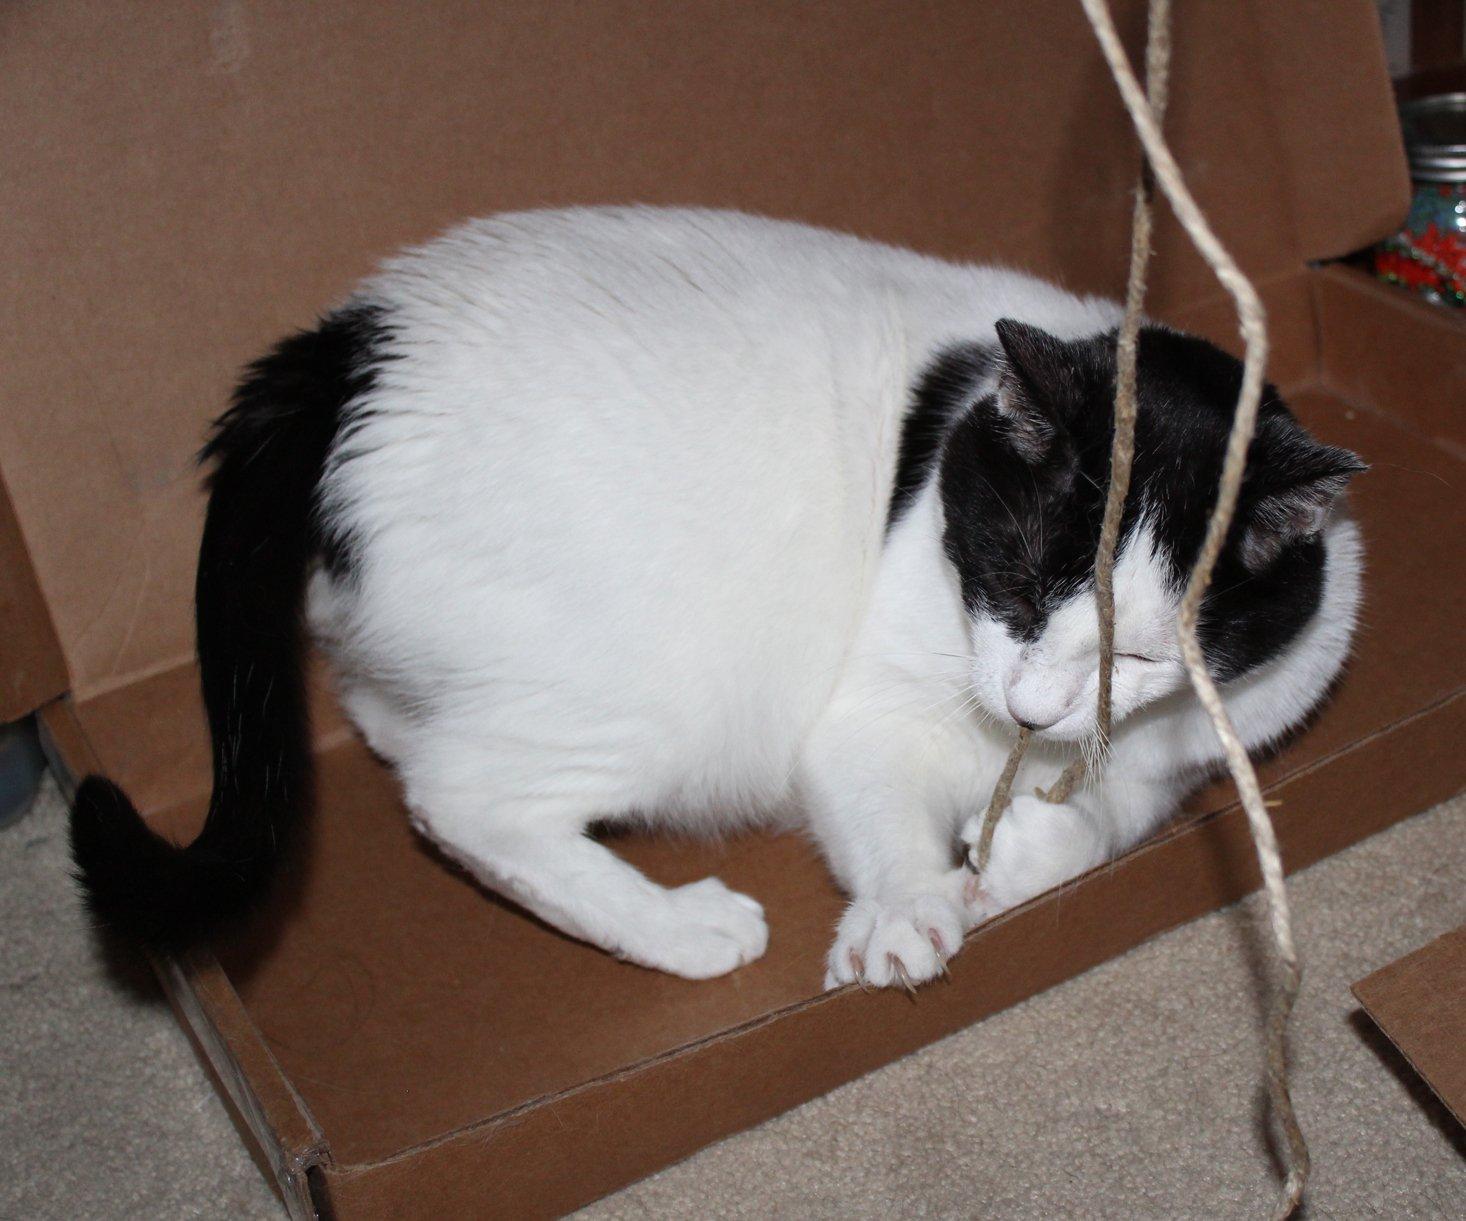 Vet Pet Box Cat October 2019 Angus 5